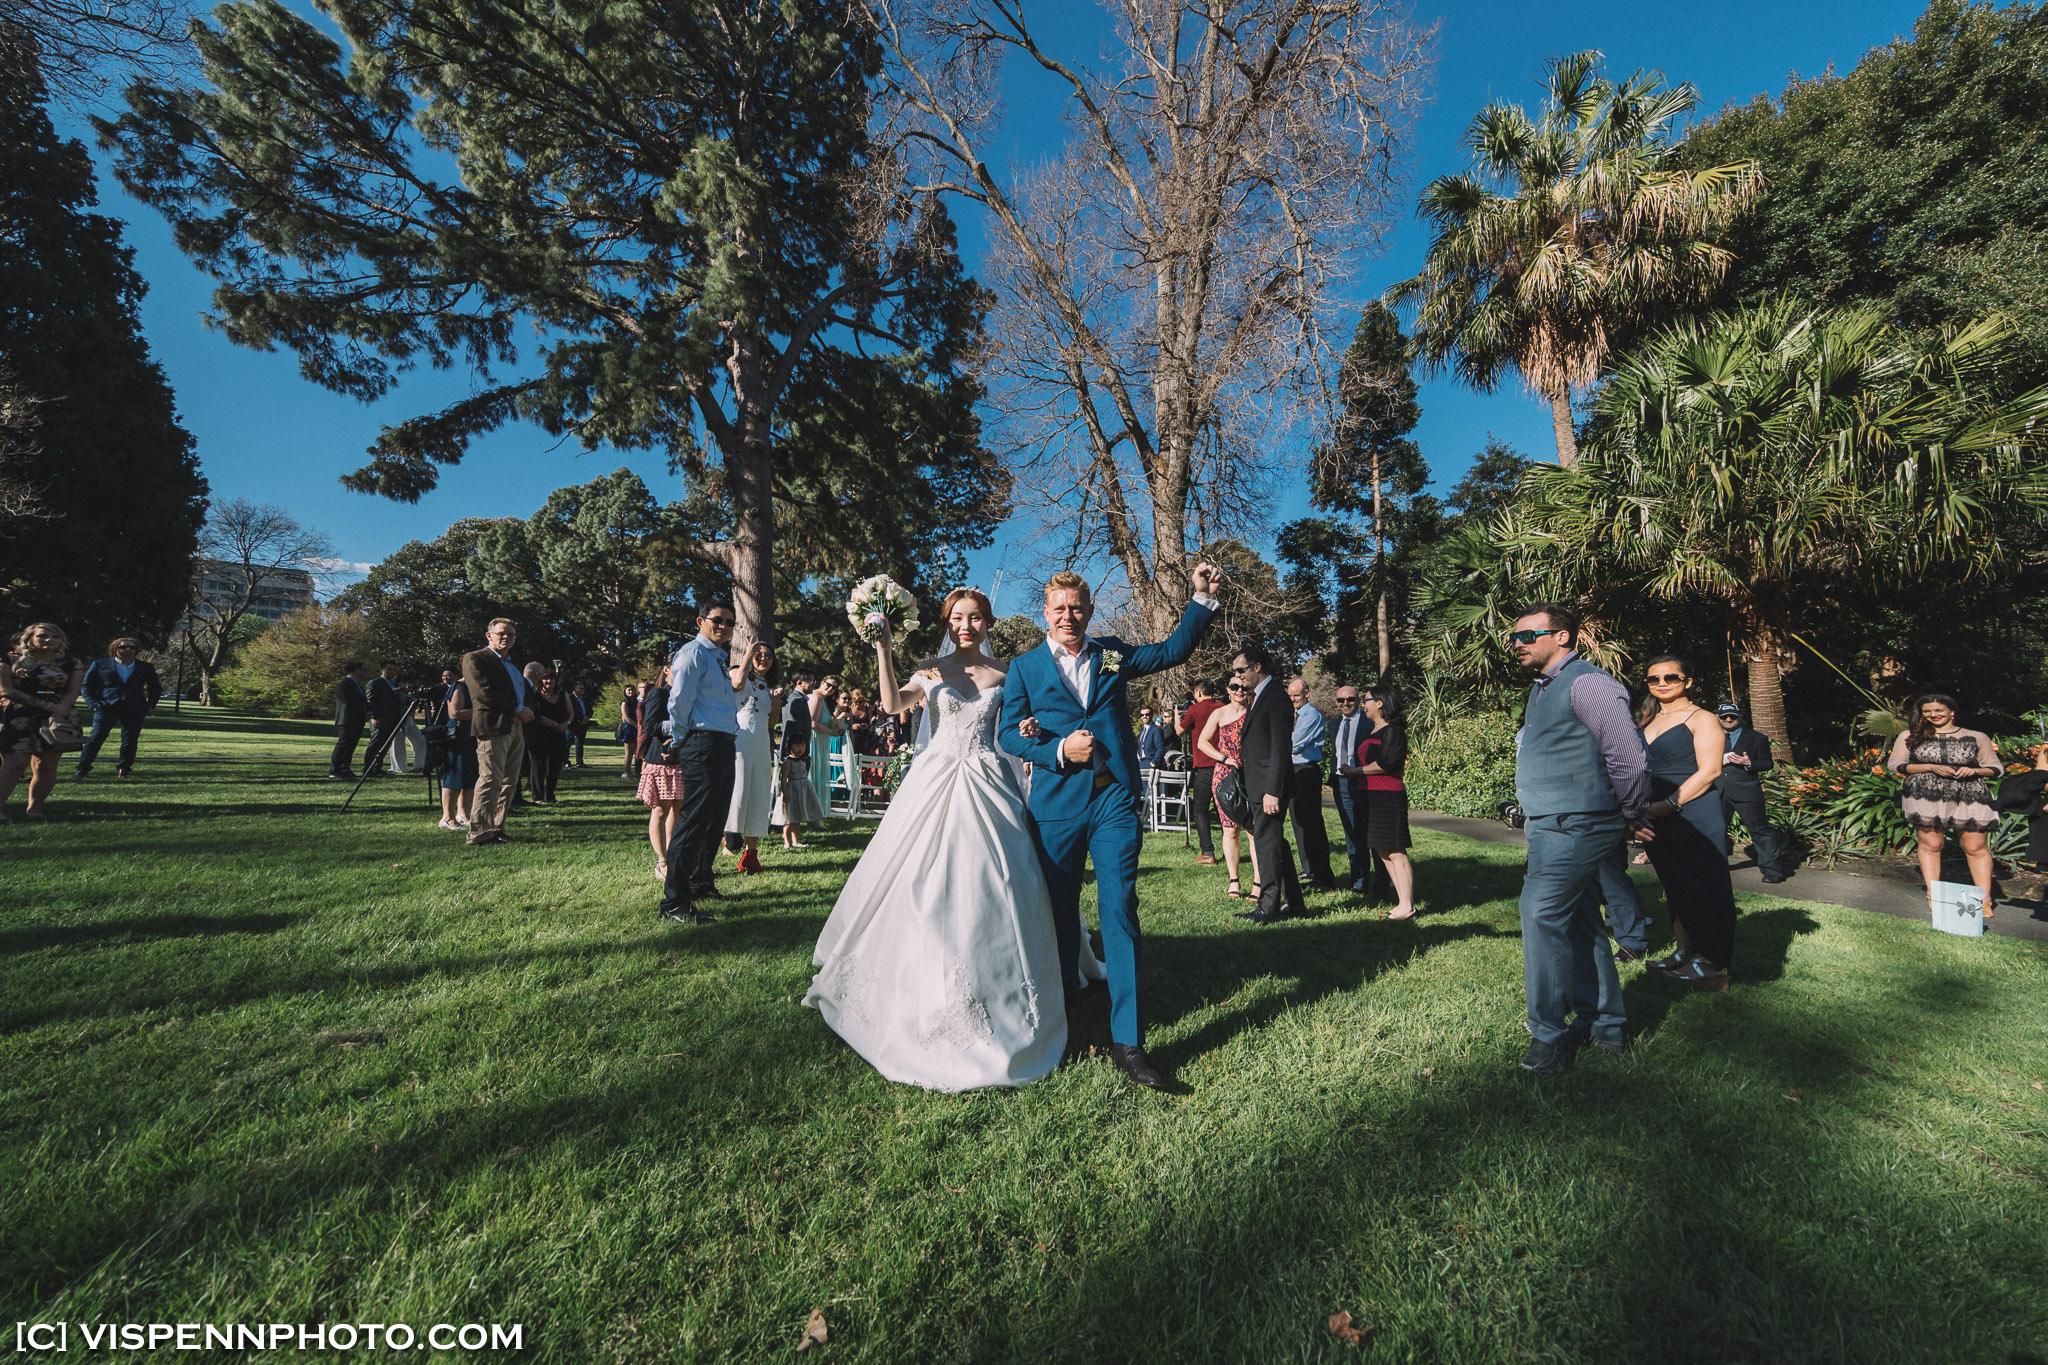 WEDDING DAY Photography Melbourne ZHPENN 1P 1DX 01834